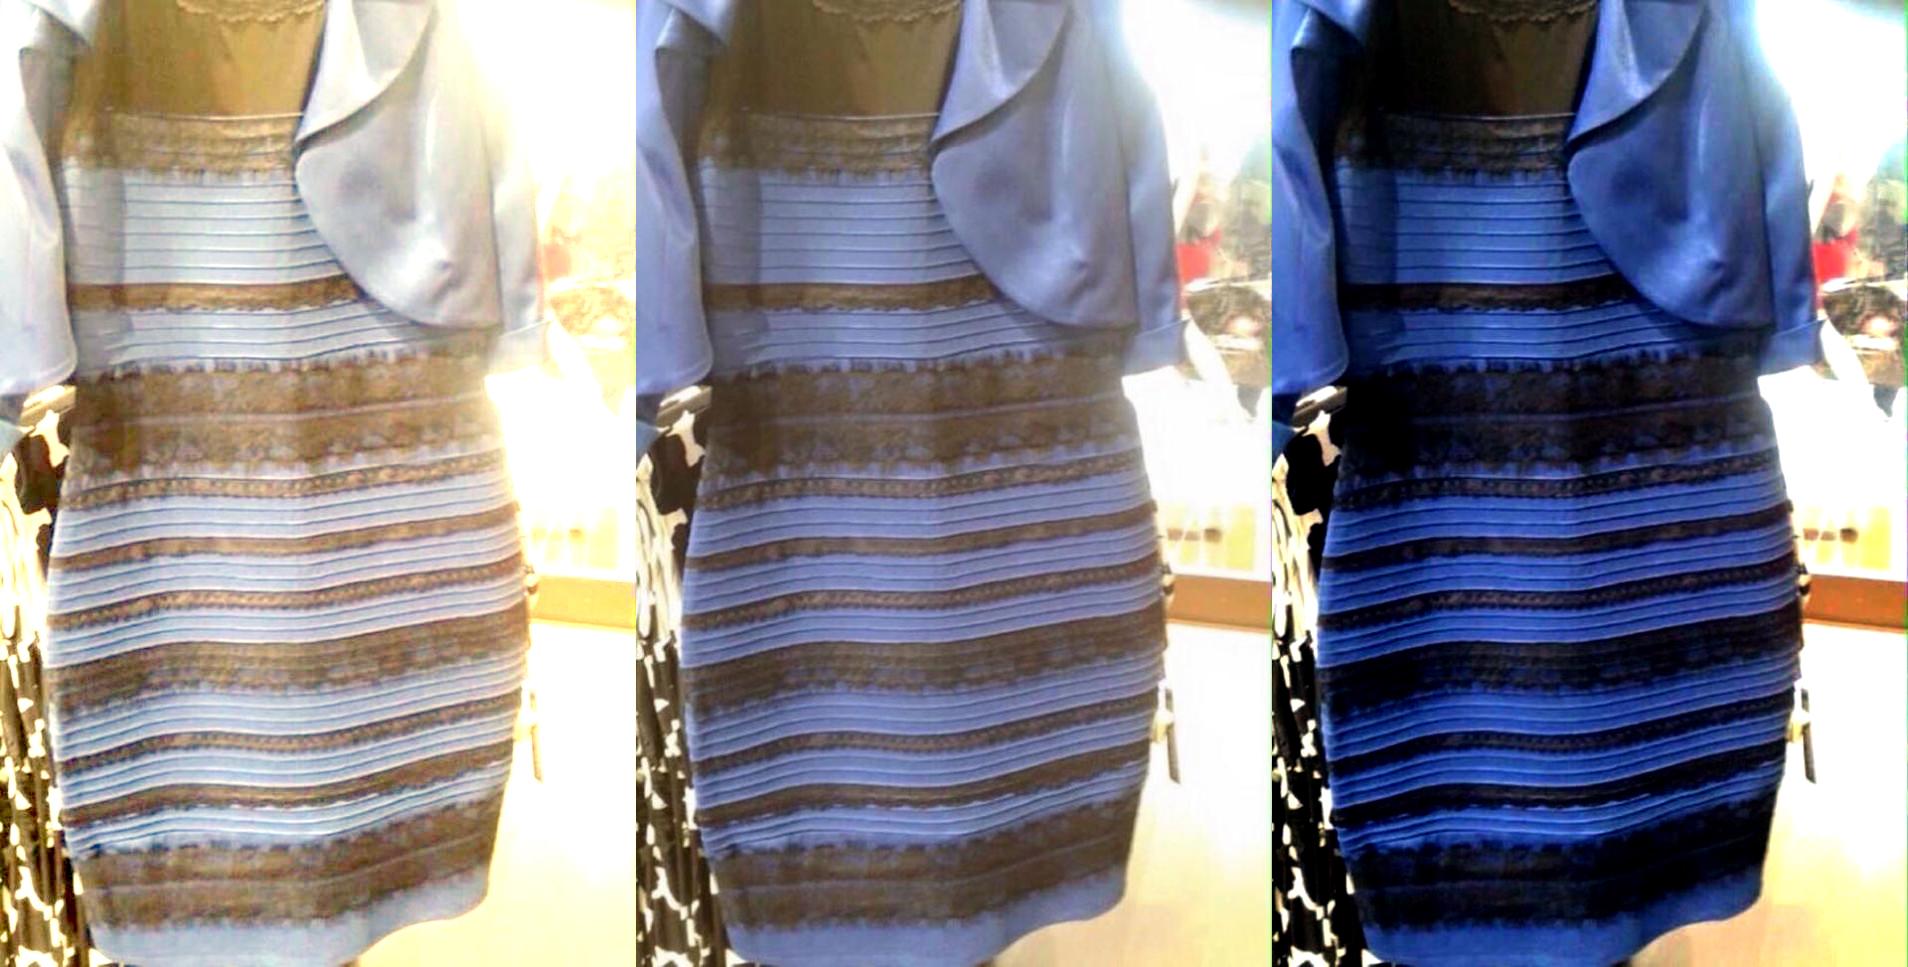 Historia do vestido azul e preto